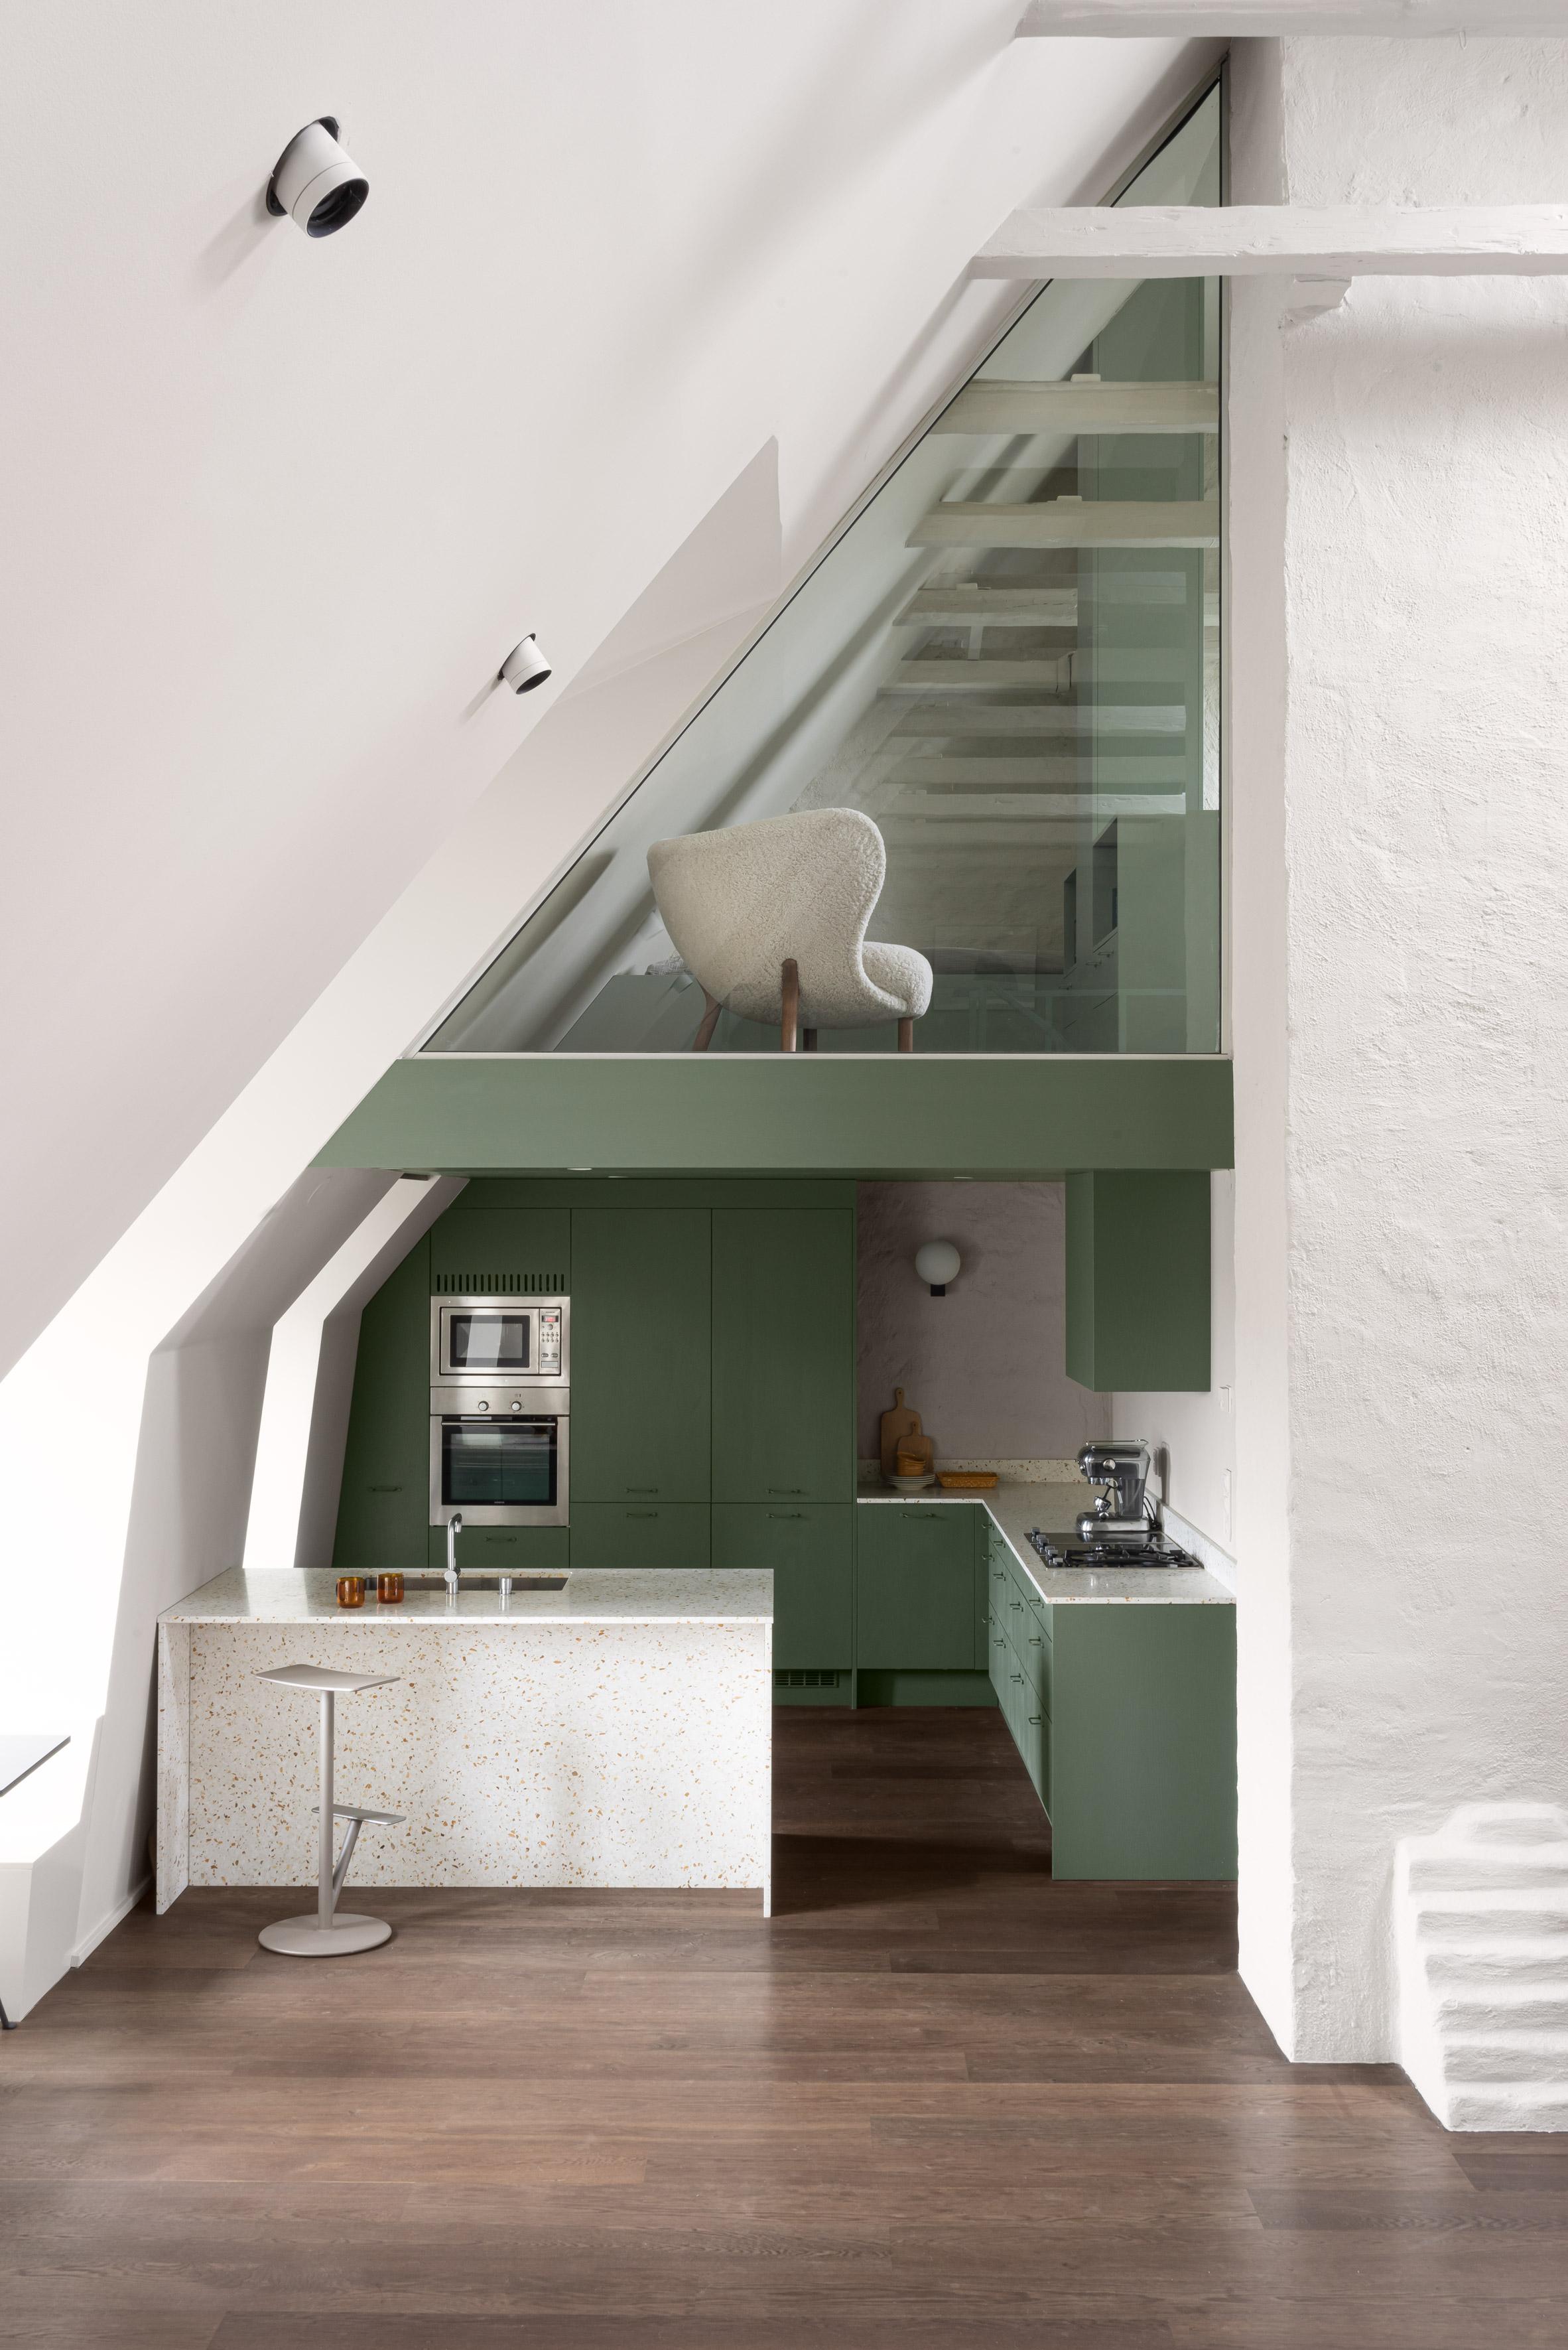 The Mantelpiece Loft by Note Design Studio